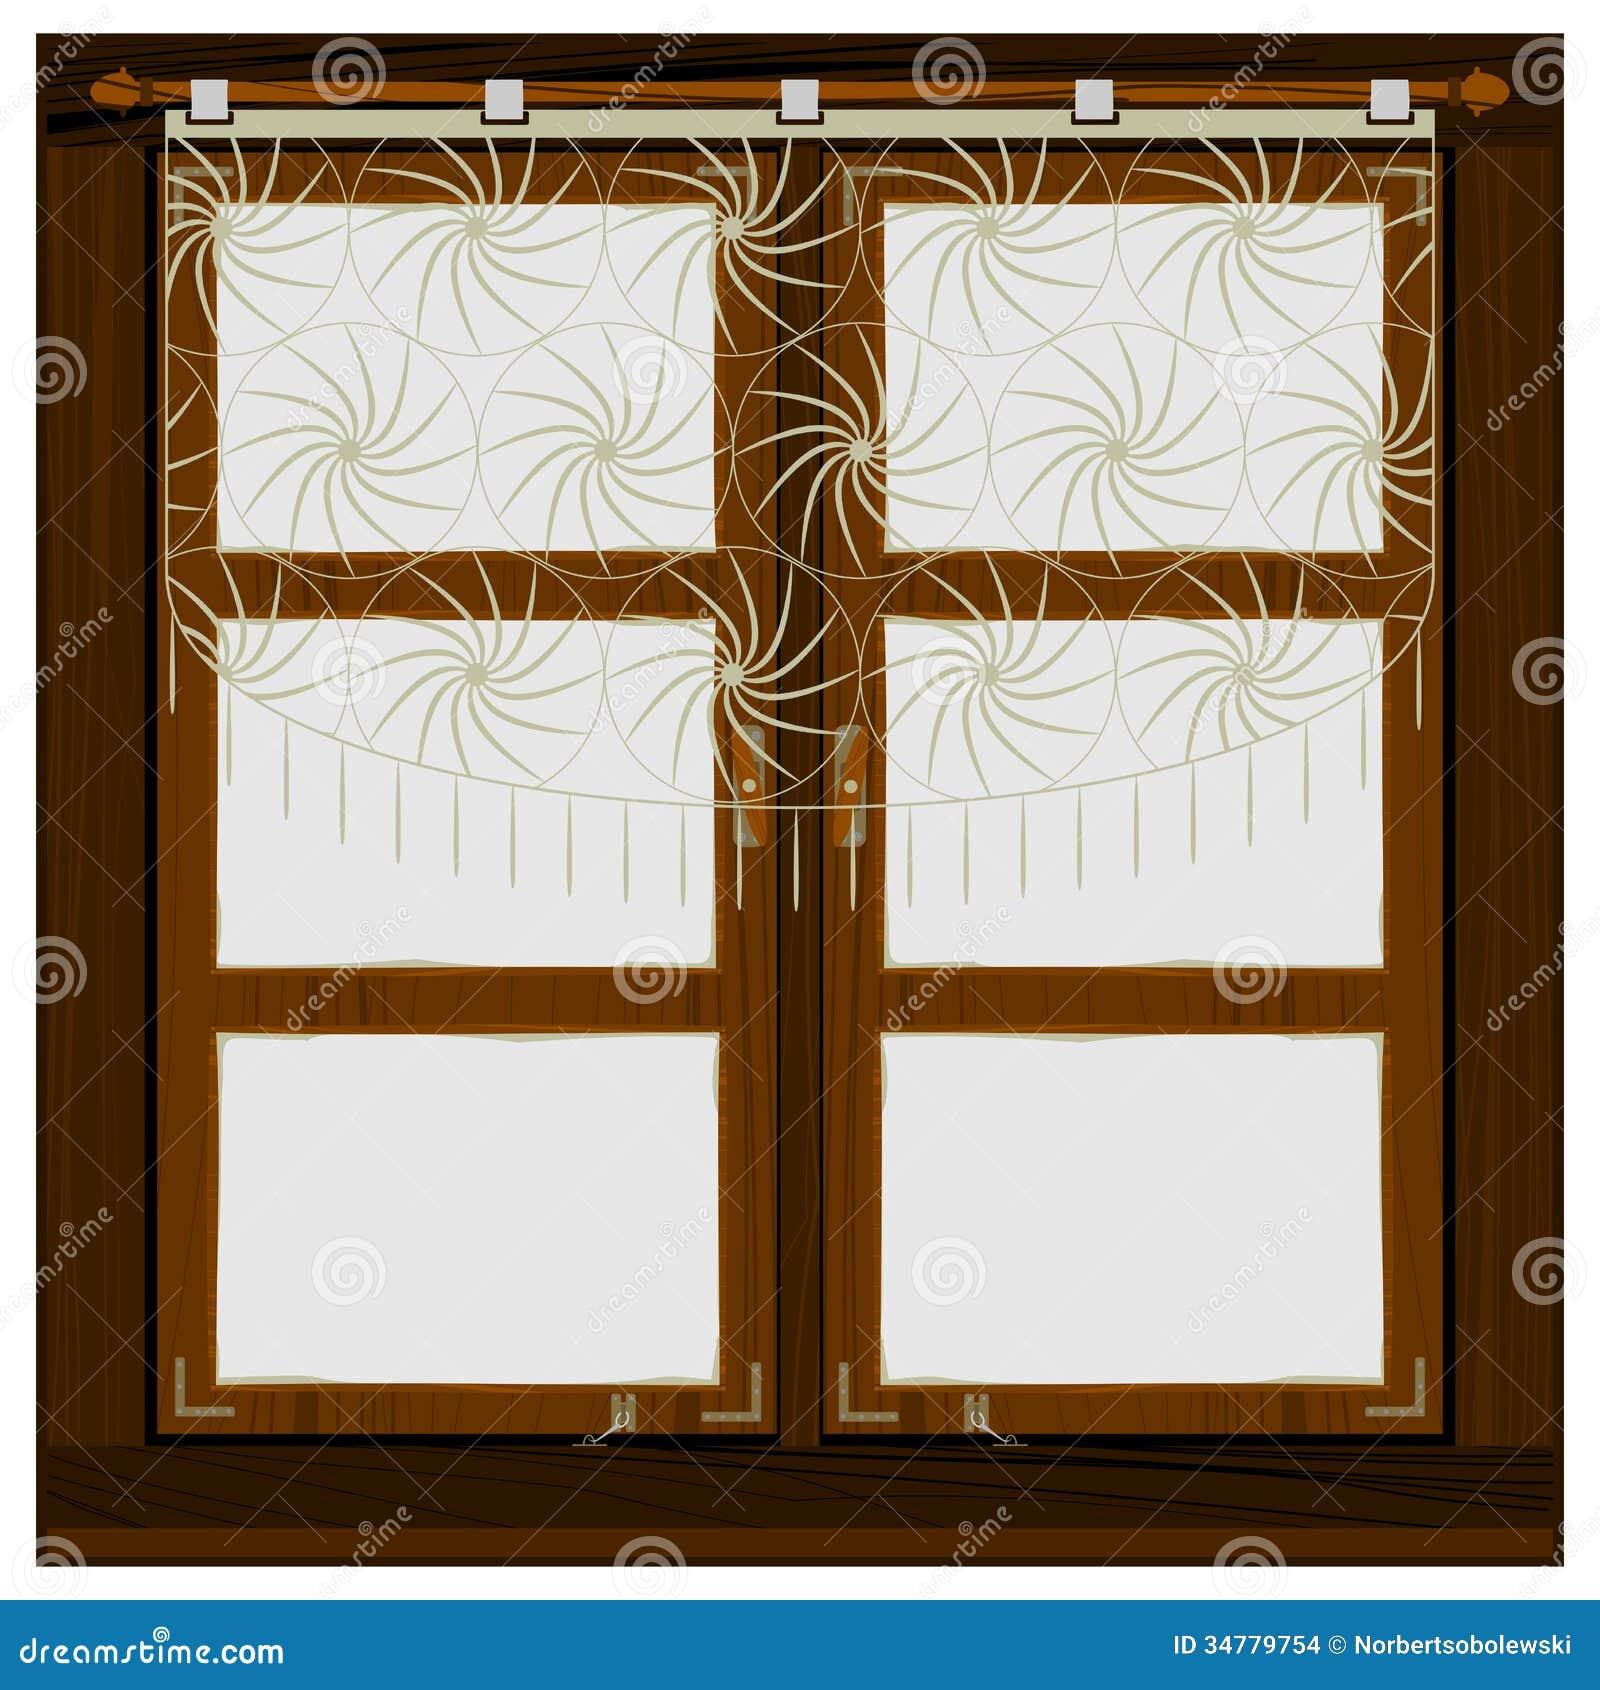 Vintage wooden window stock vector image of design for New wood window design